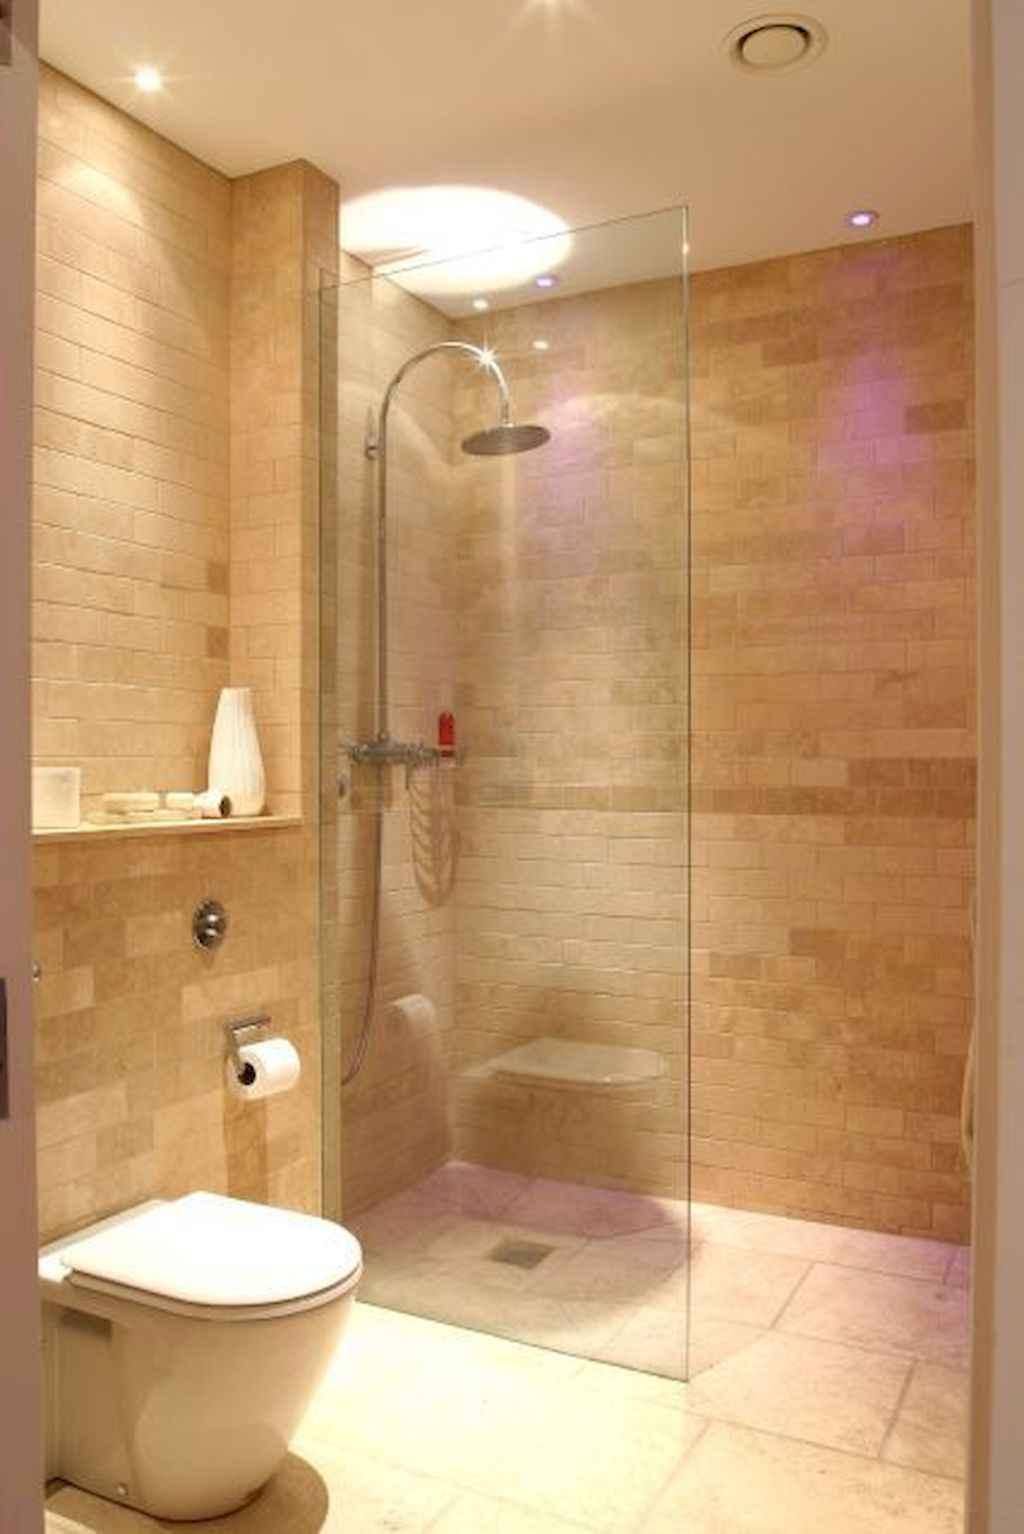 111 Brilliant Small Bathroom Remodel Ideas On A Budget (79)